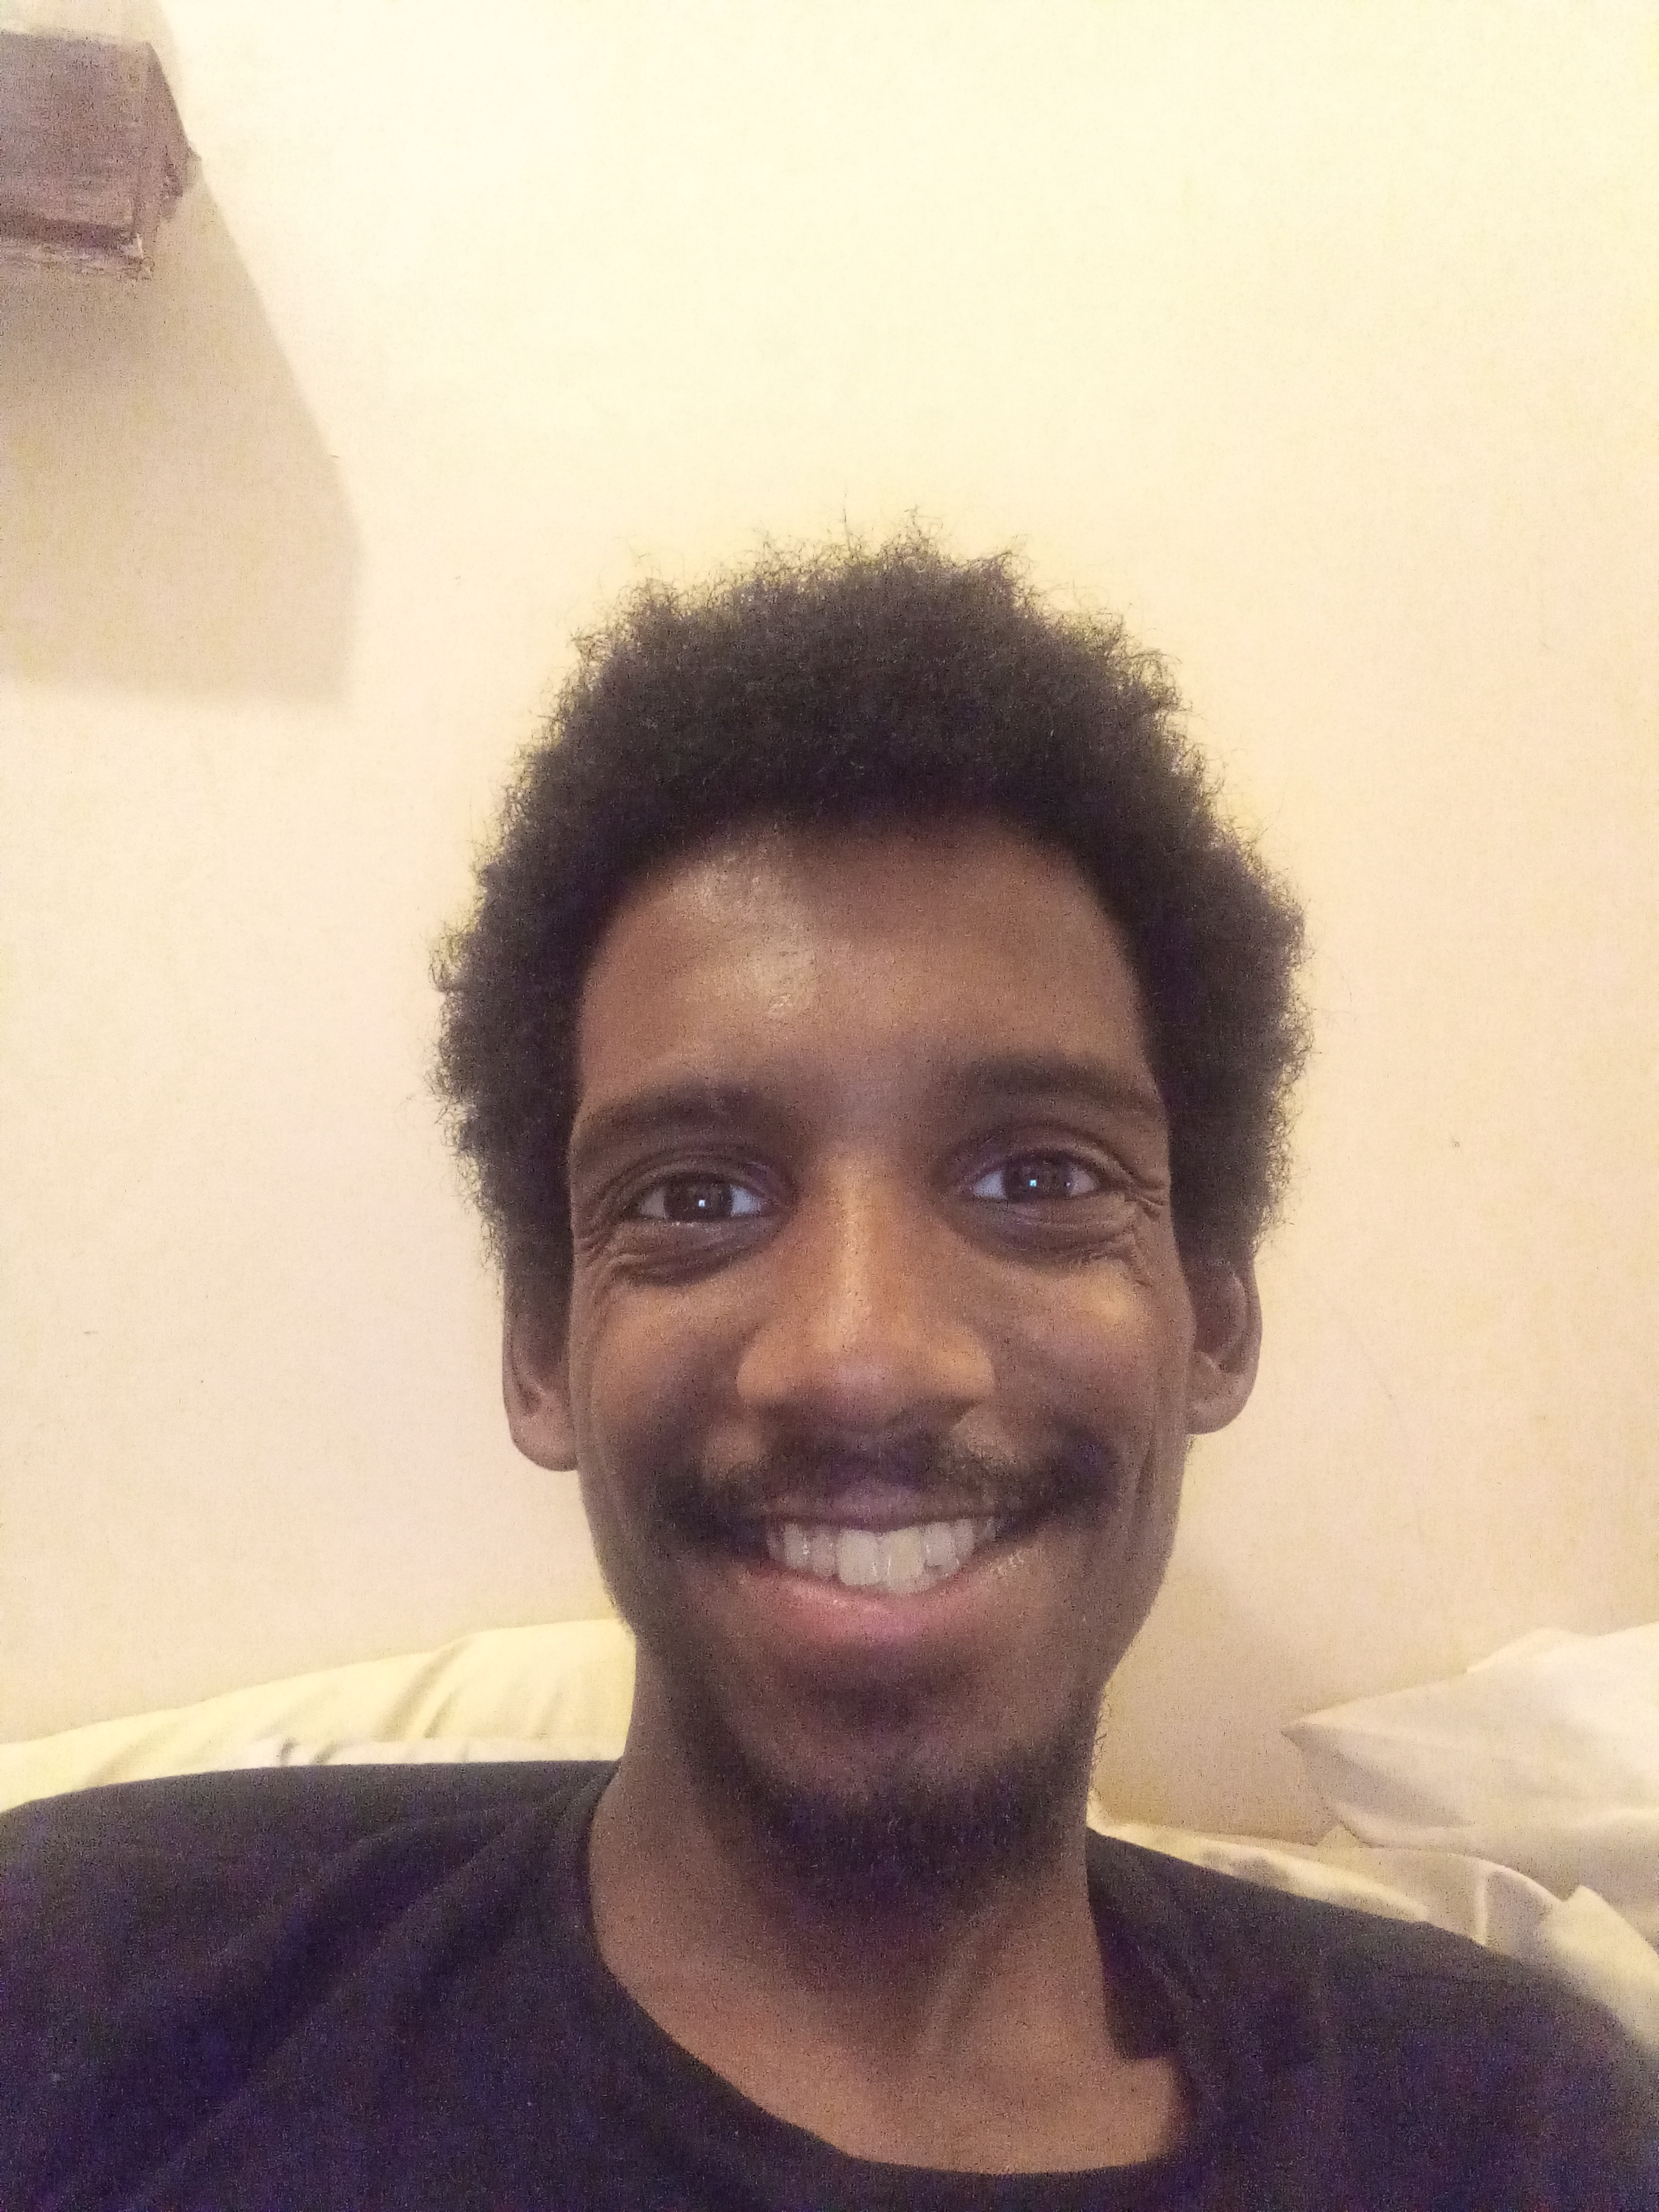 Profile photo of Abdulrahman Ammer